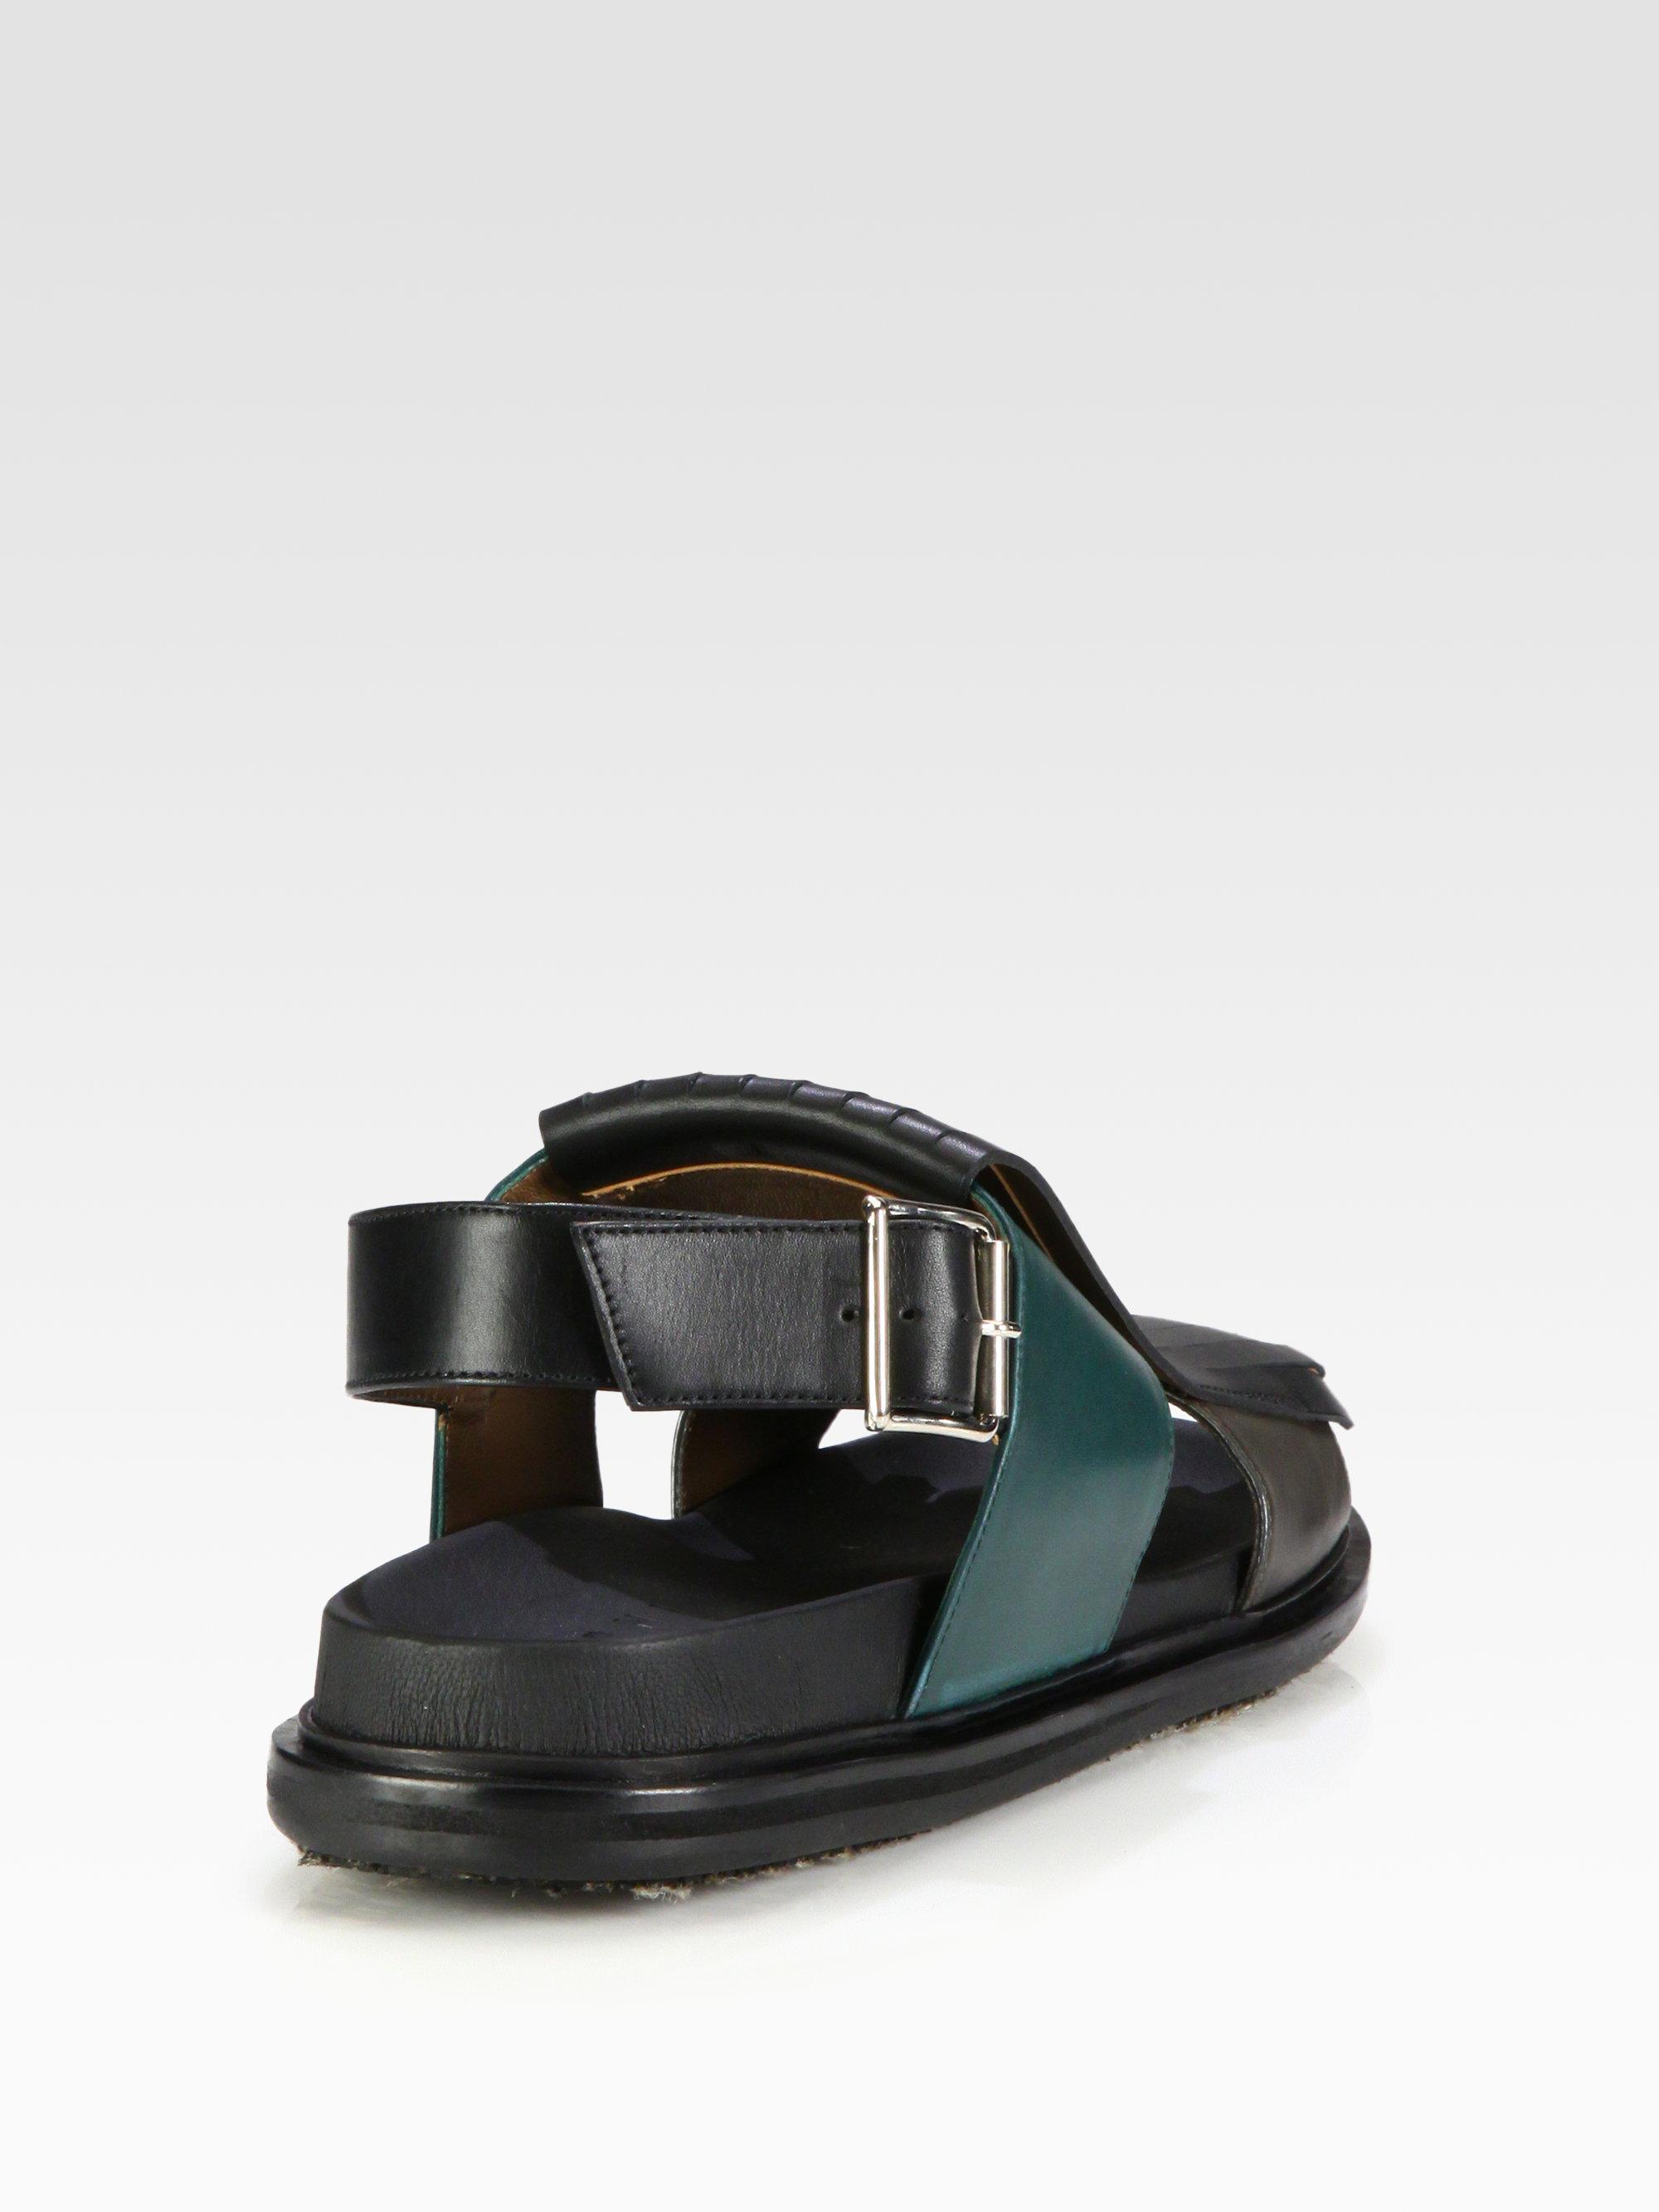 Marni Fussbett Sandal in Grey (Black